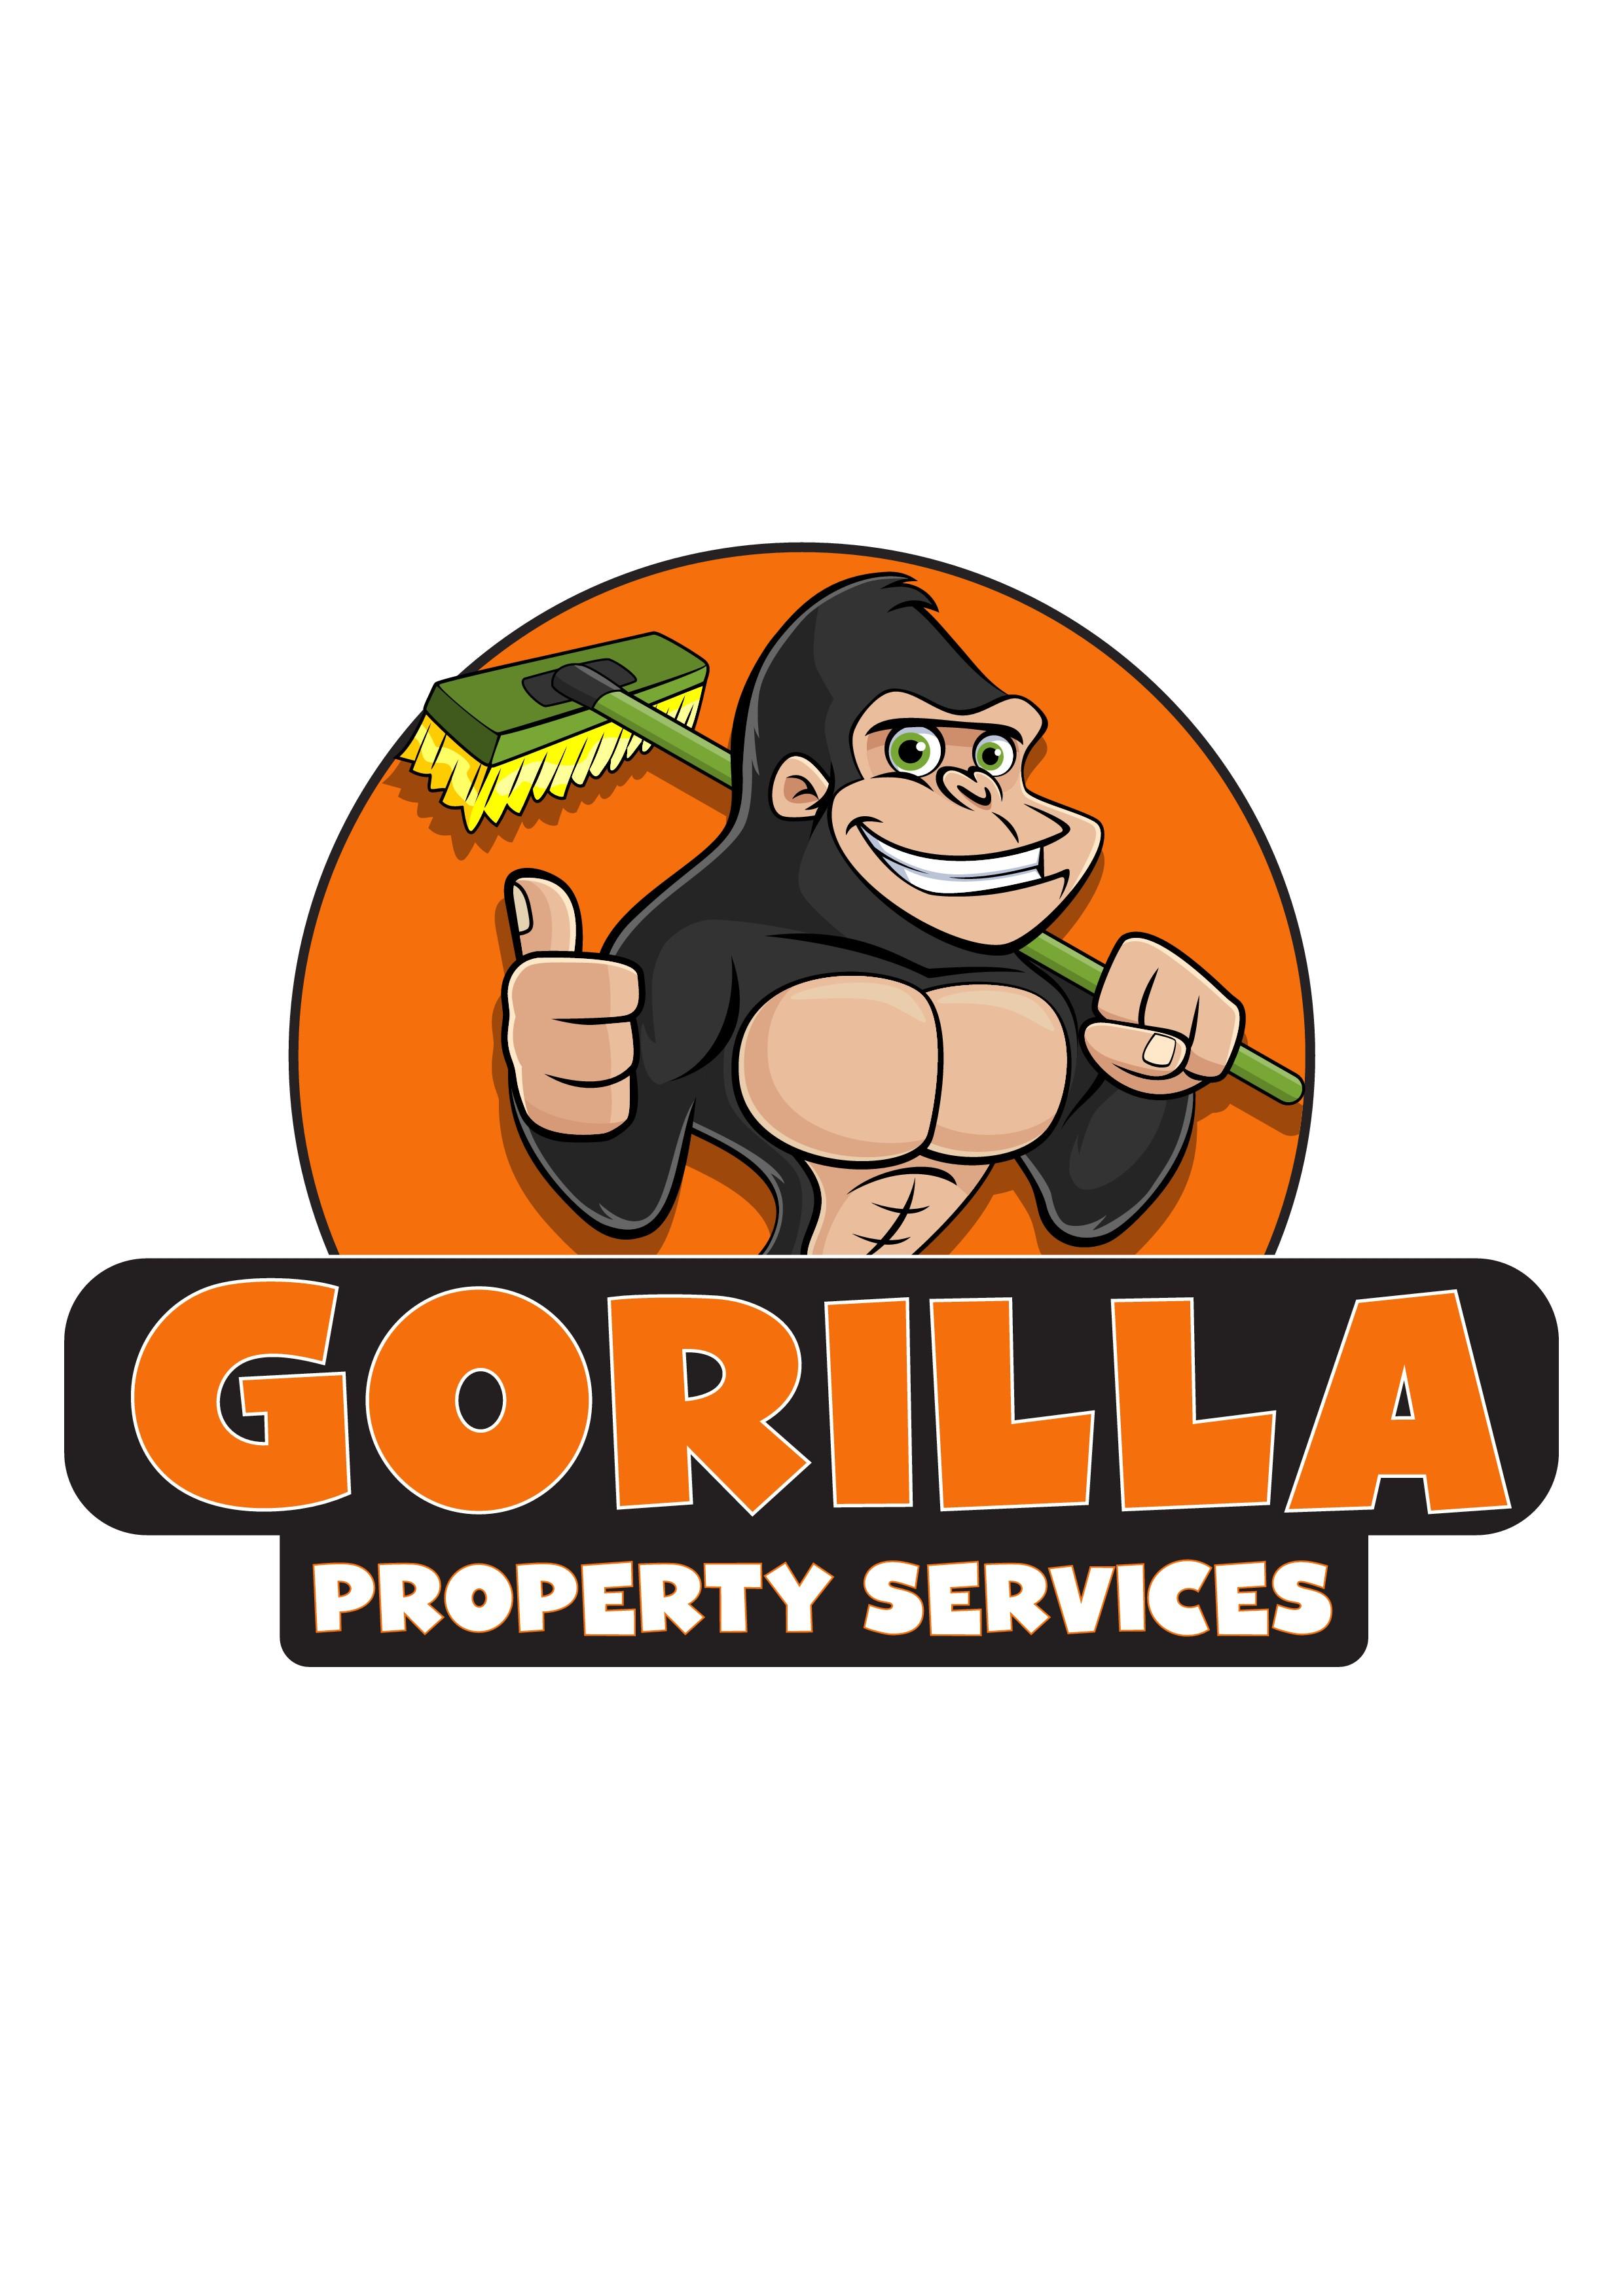 Funky, Cool Gorilla Logo Needed!